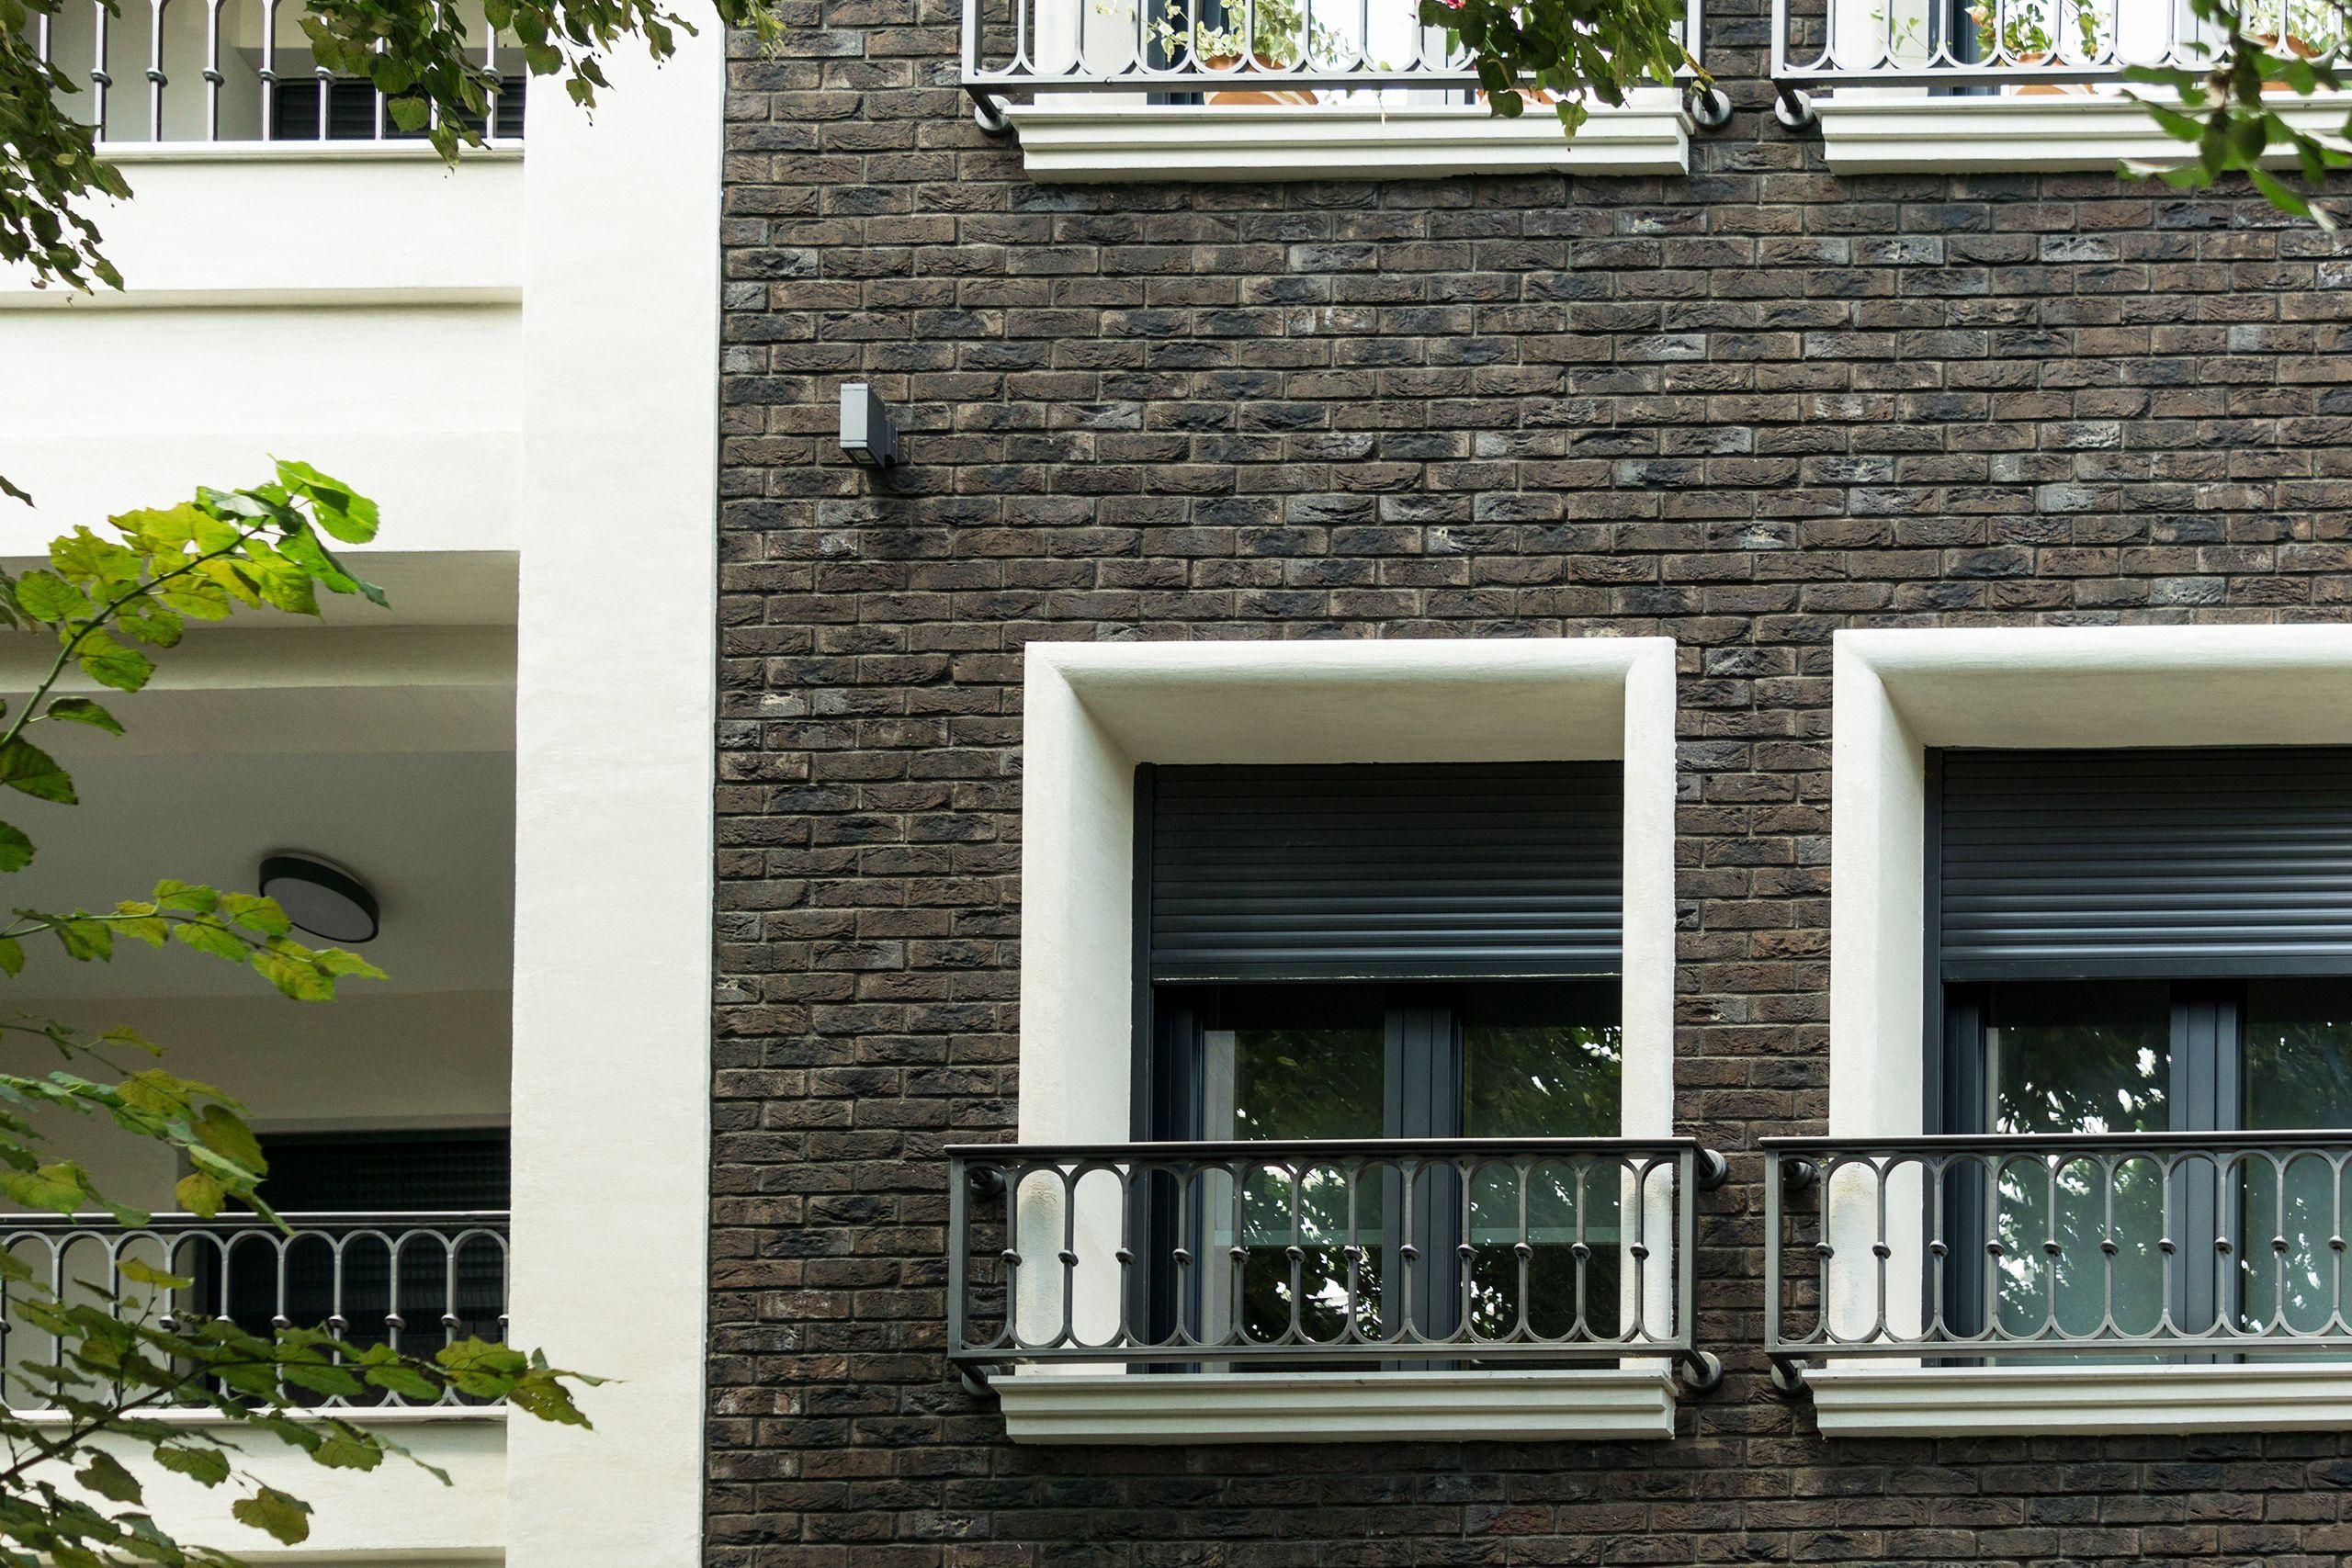 Fasada od crnih cigli i beli prozori